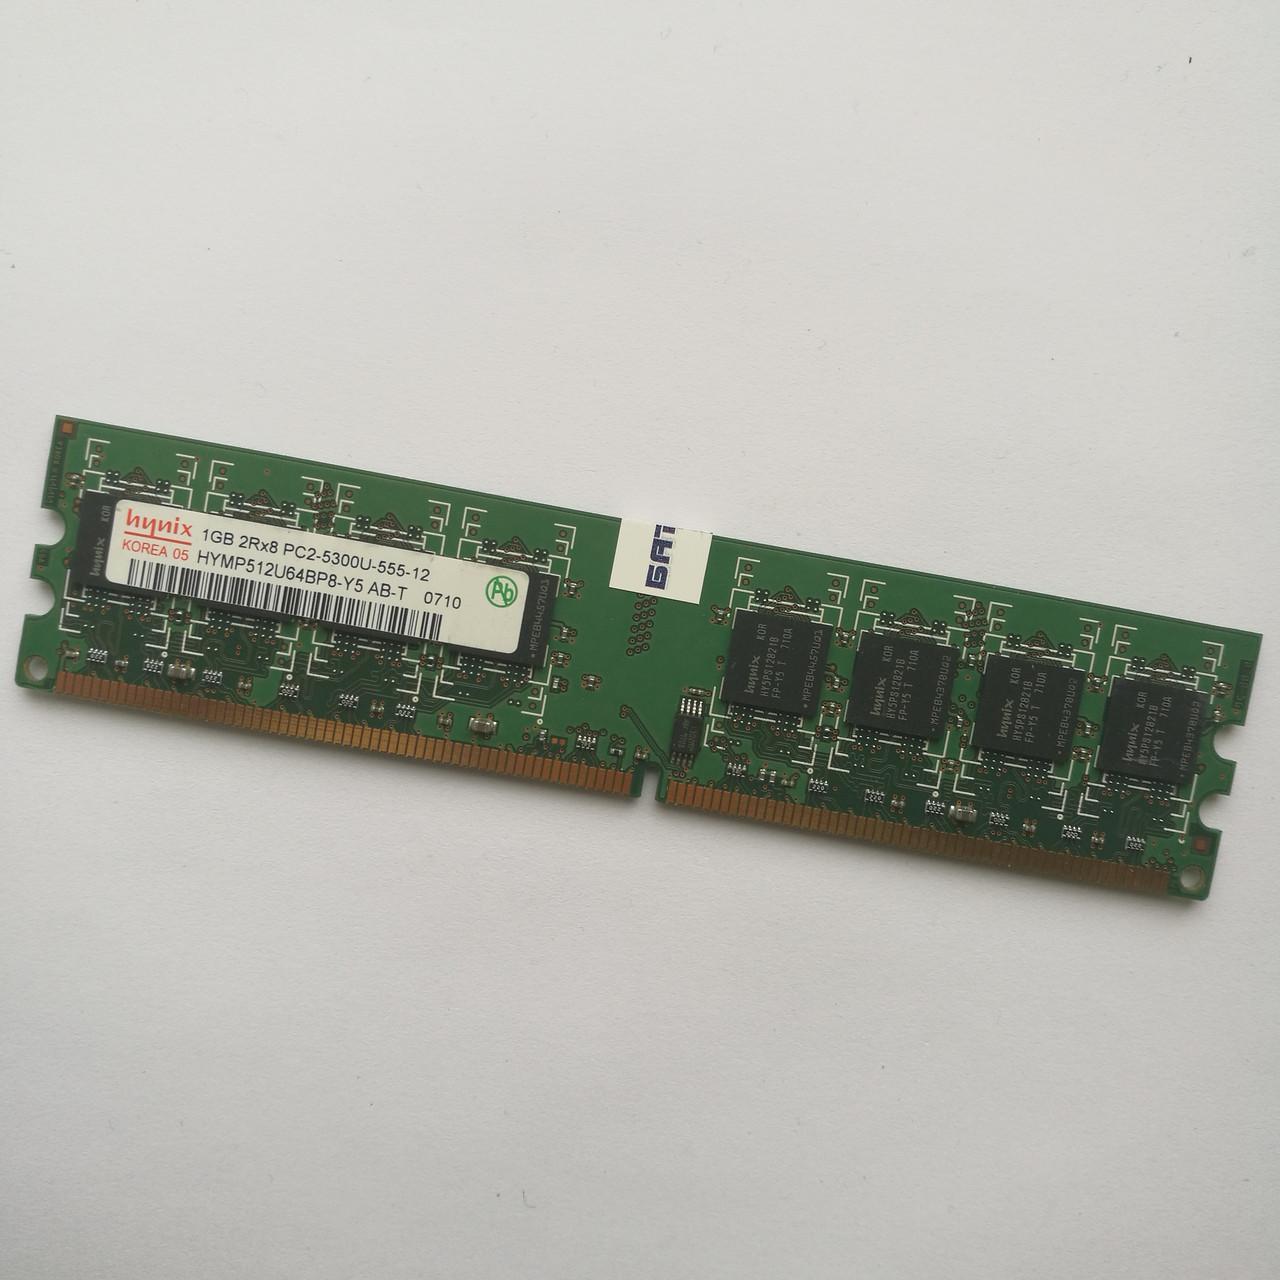 Оперативная память Hynix DDR2 1Gb 667MHz PC2 5300U 2R8 CL5 (HYMP512U64BP8-Y5 AB-T) Б/У